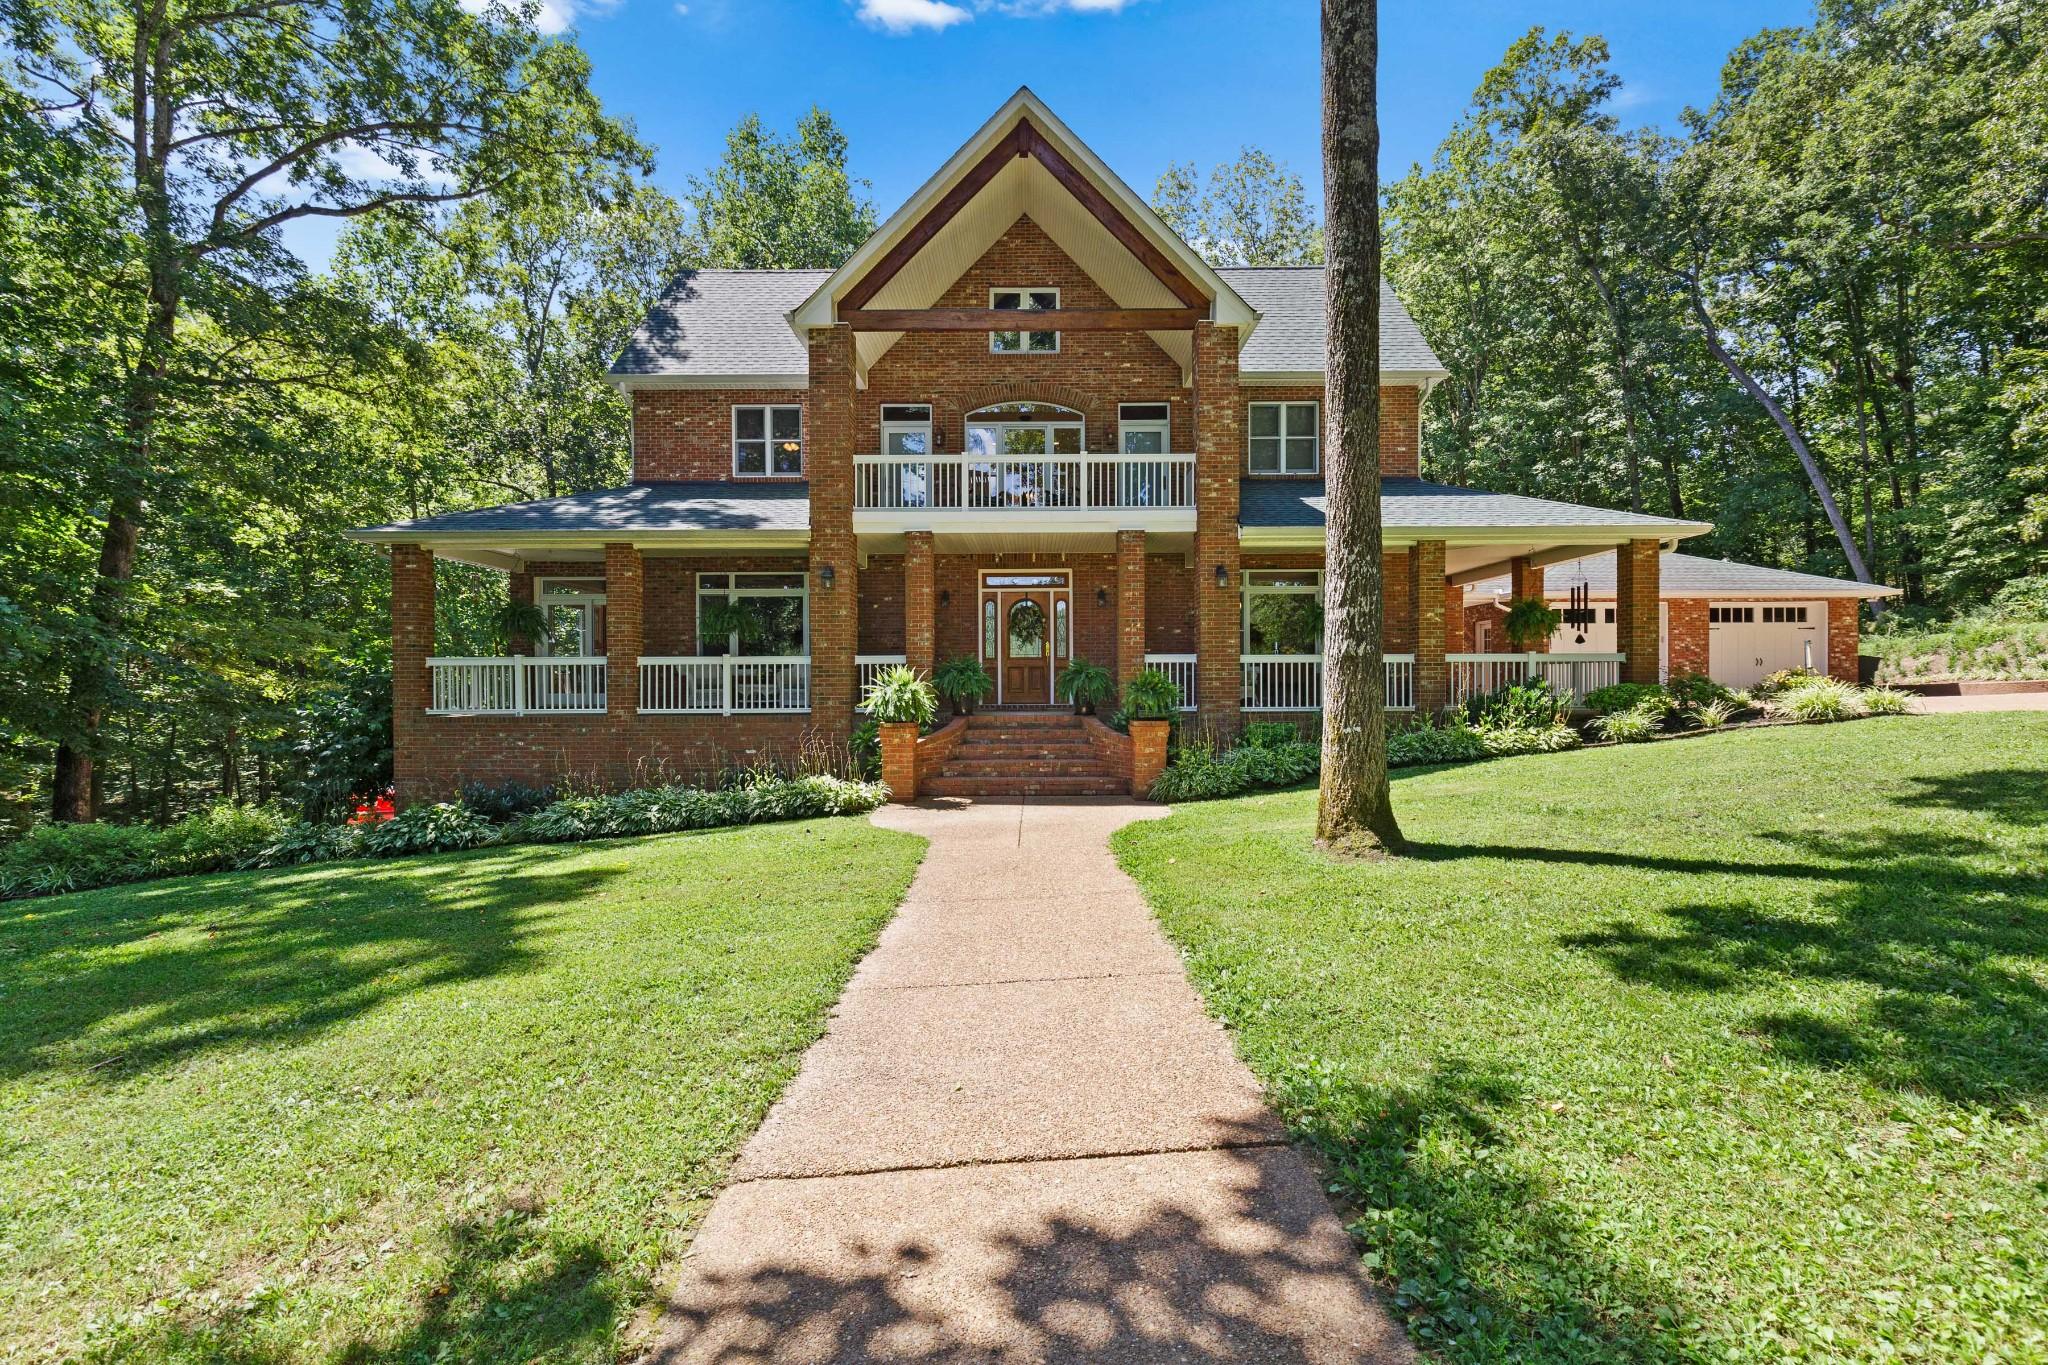 196 Brooks Ln Property Photo - Portland, TN real estate listing